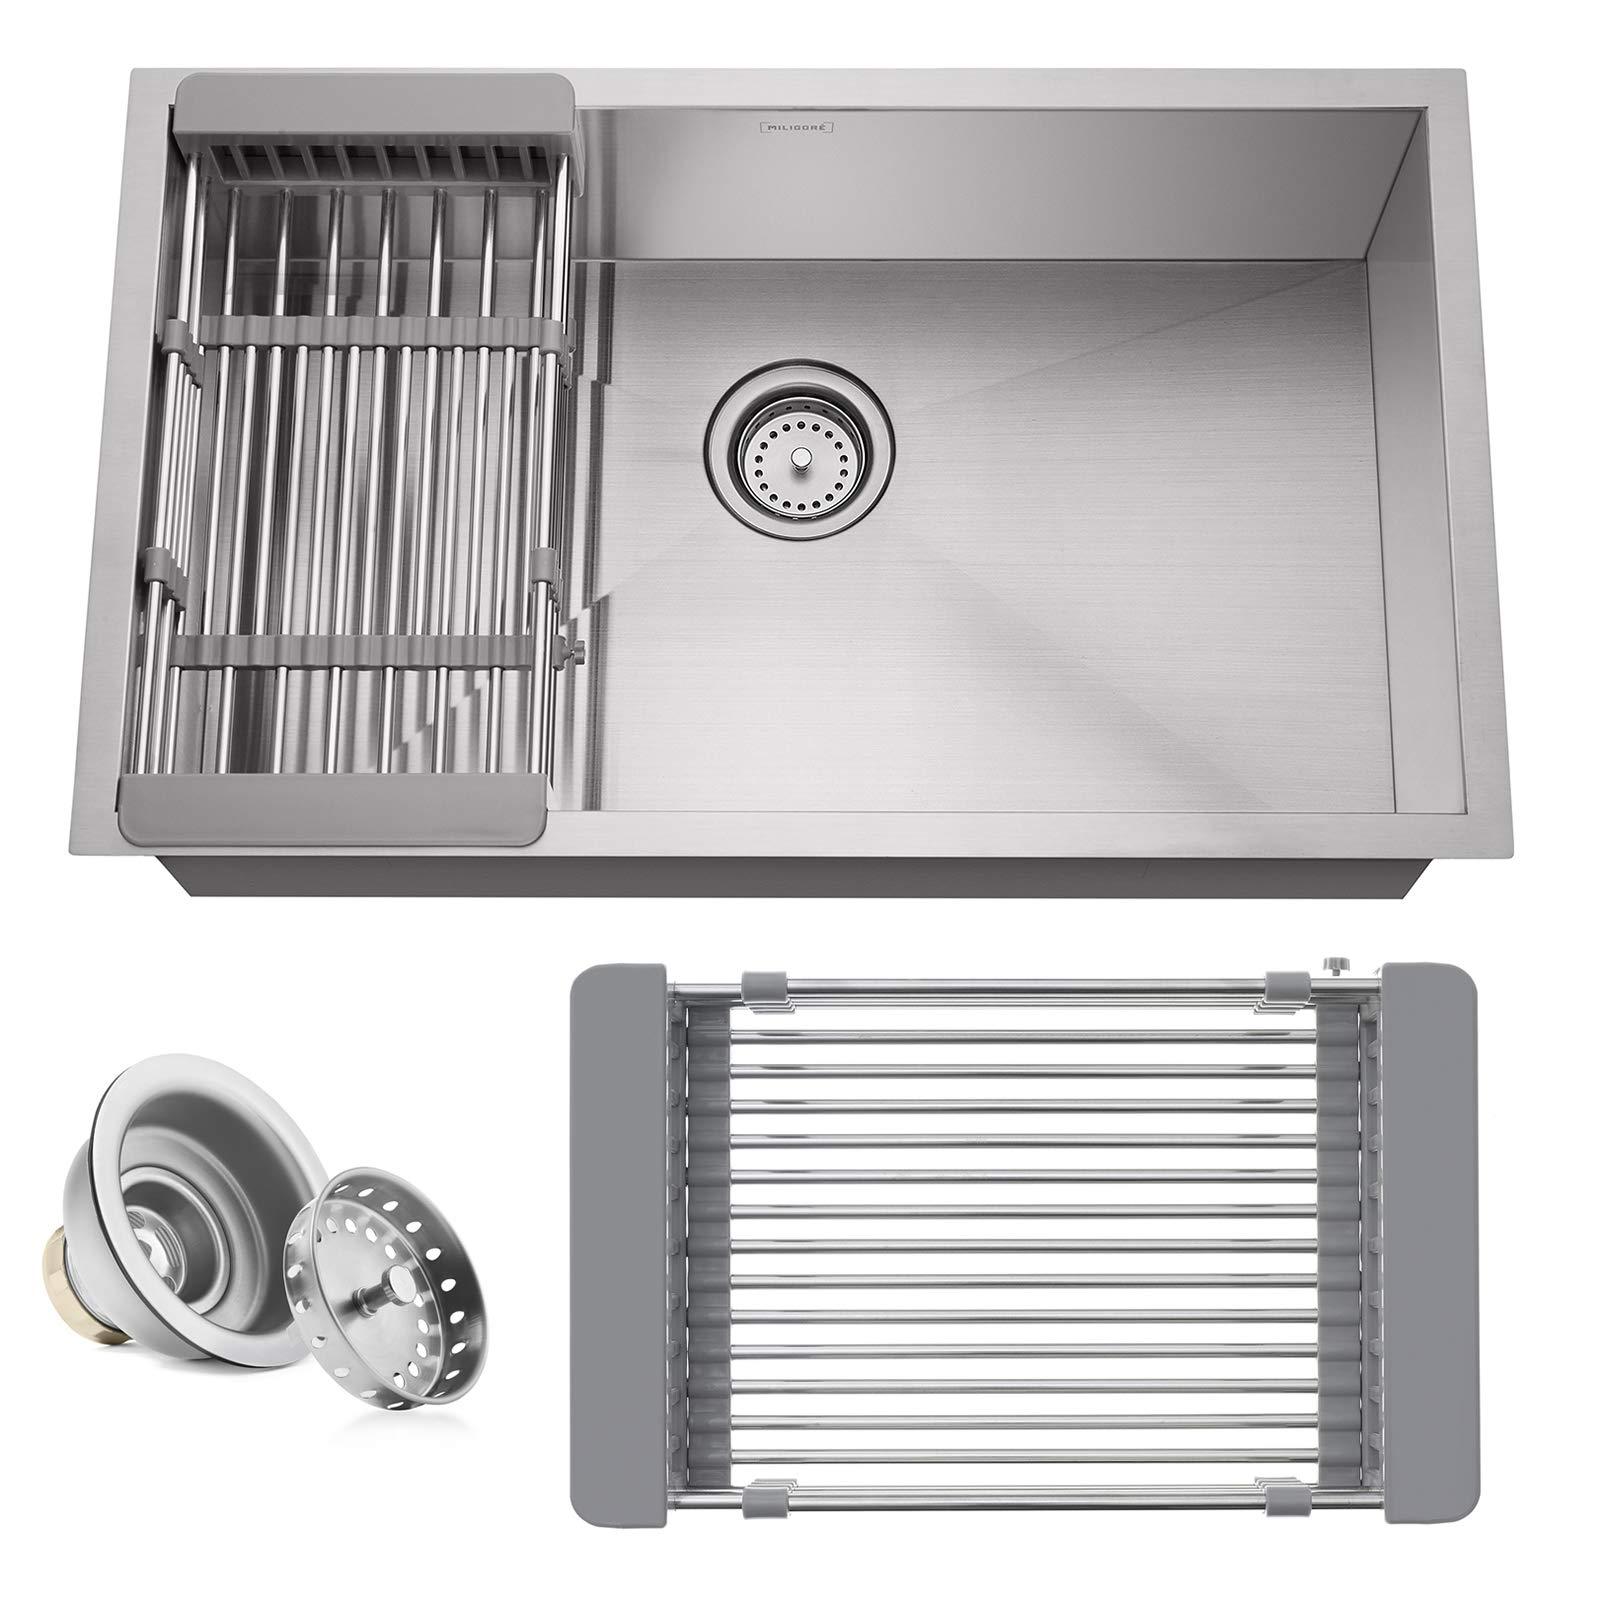 Miligore 30'' x 18'' x 9'' Deep Single Bowl Undermount Zero Radius Stainless Steel Kitchen Sink - Includes Drain/Adjustable Dish Rack